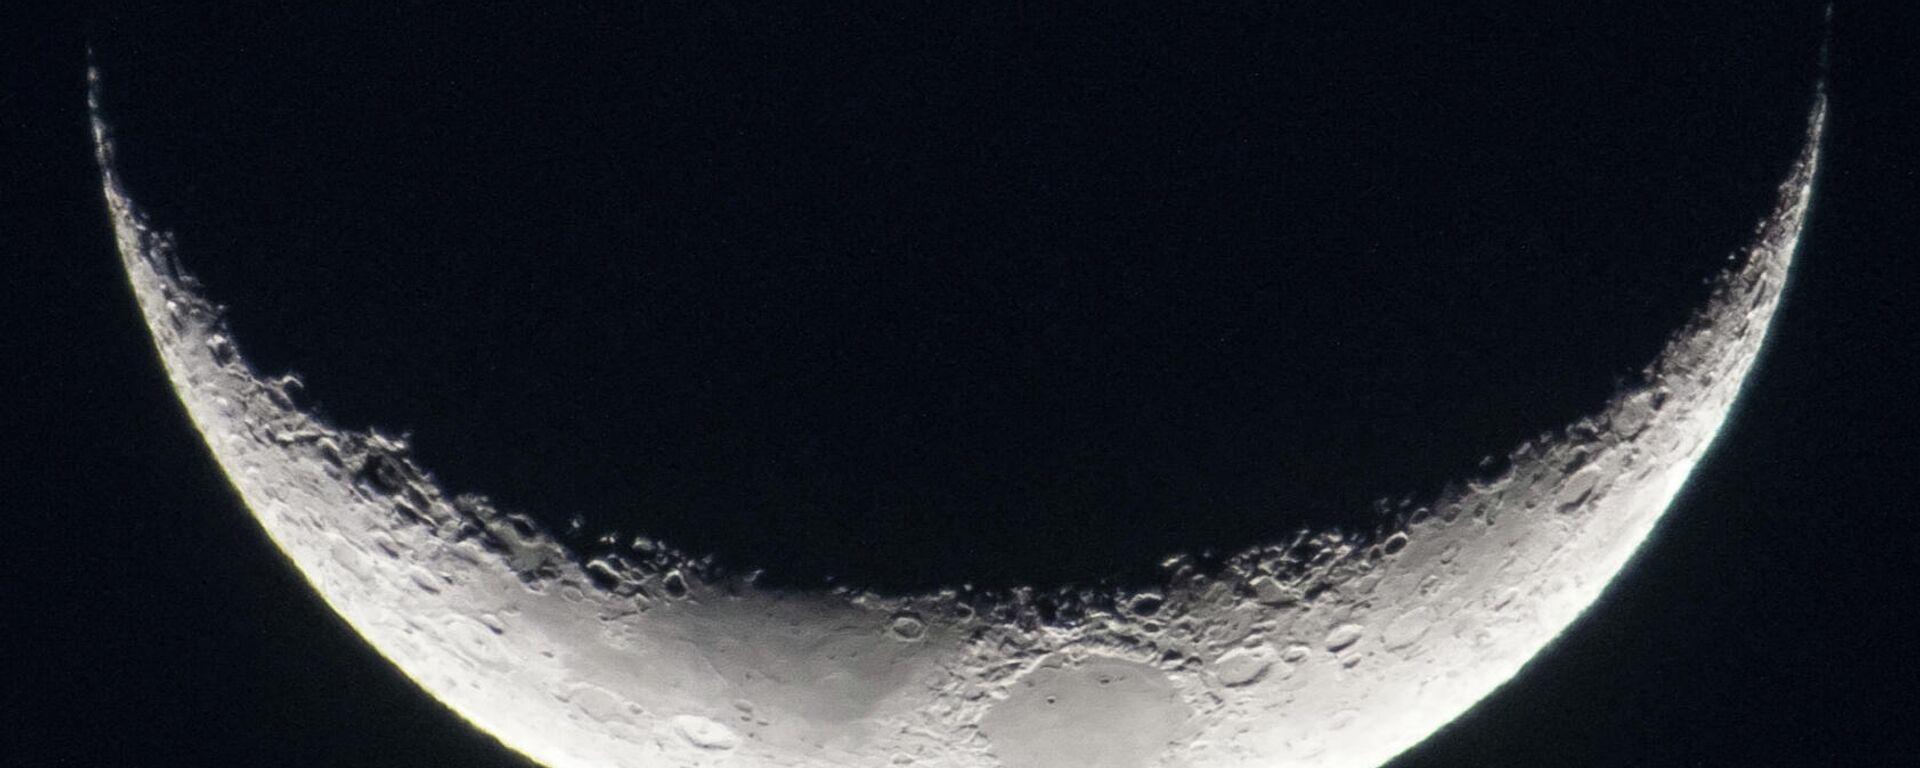 Mond (Symbolfoto) - SNA, 1920, 03.02.2021